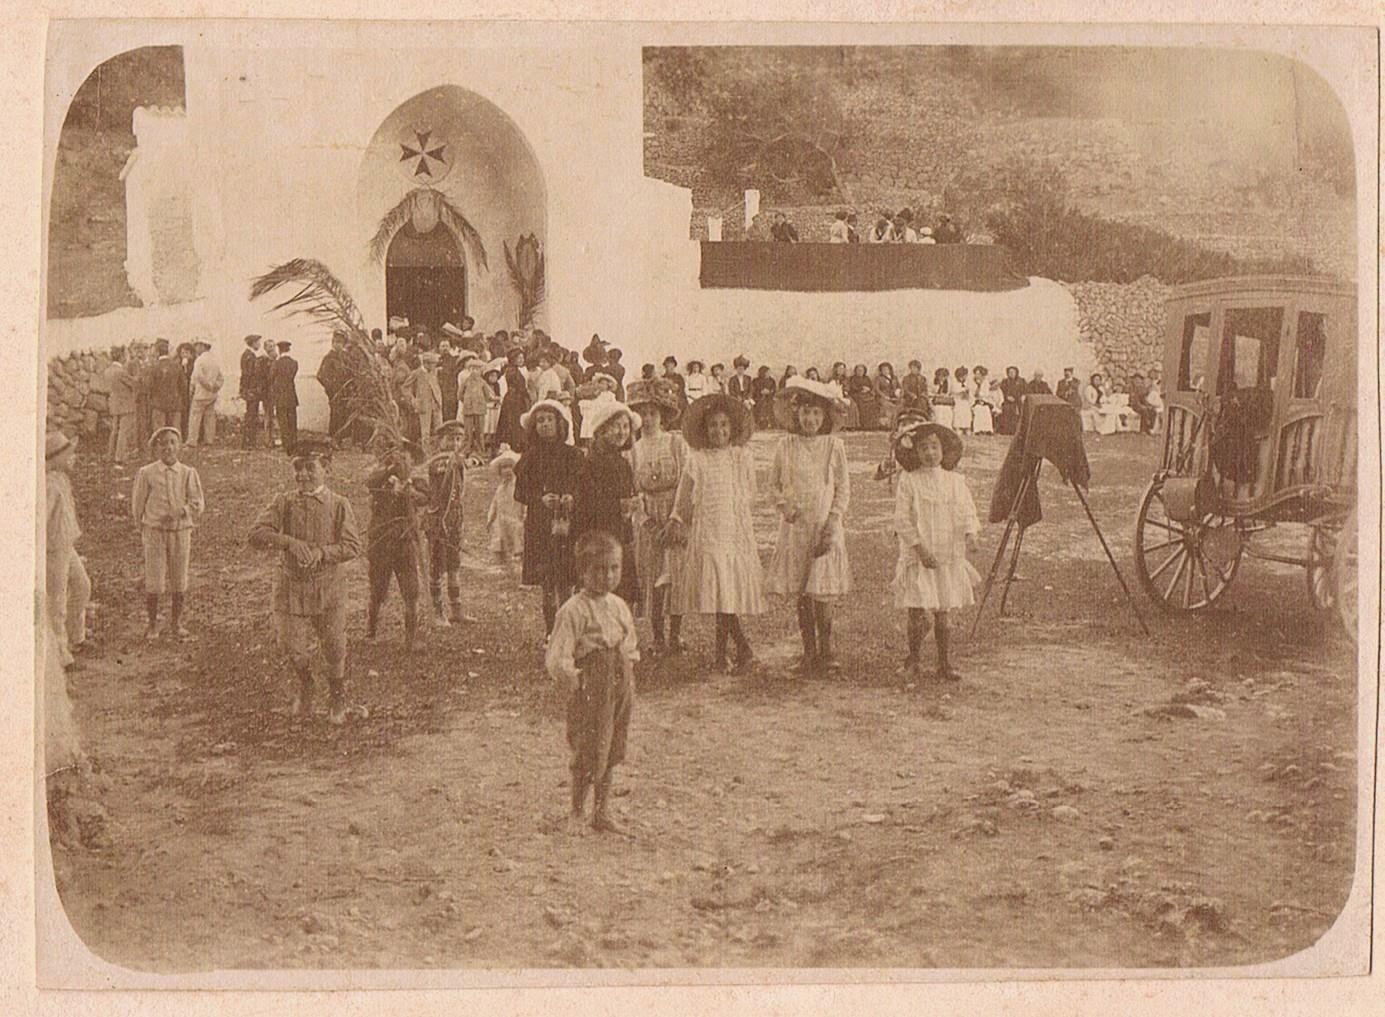 Menorca, IMATGES D´EN PRIMER: Ciutadella. bwin 5 euro bwin Newsletter Retrat de fieta, any 1925